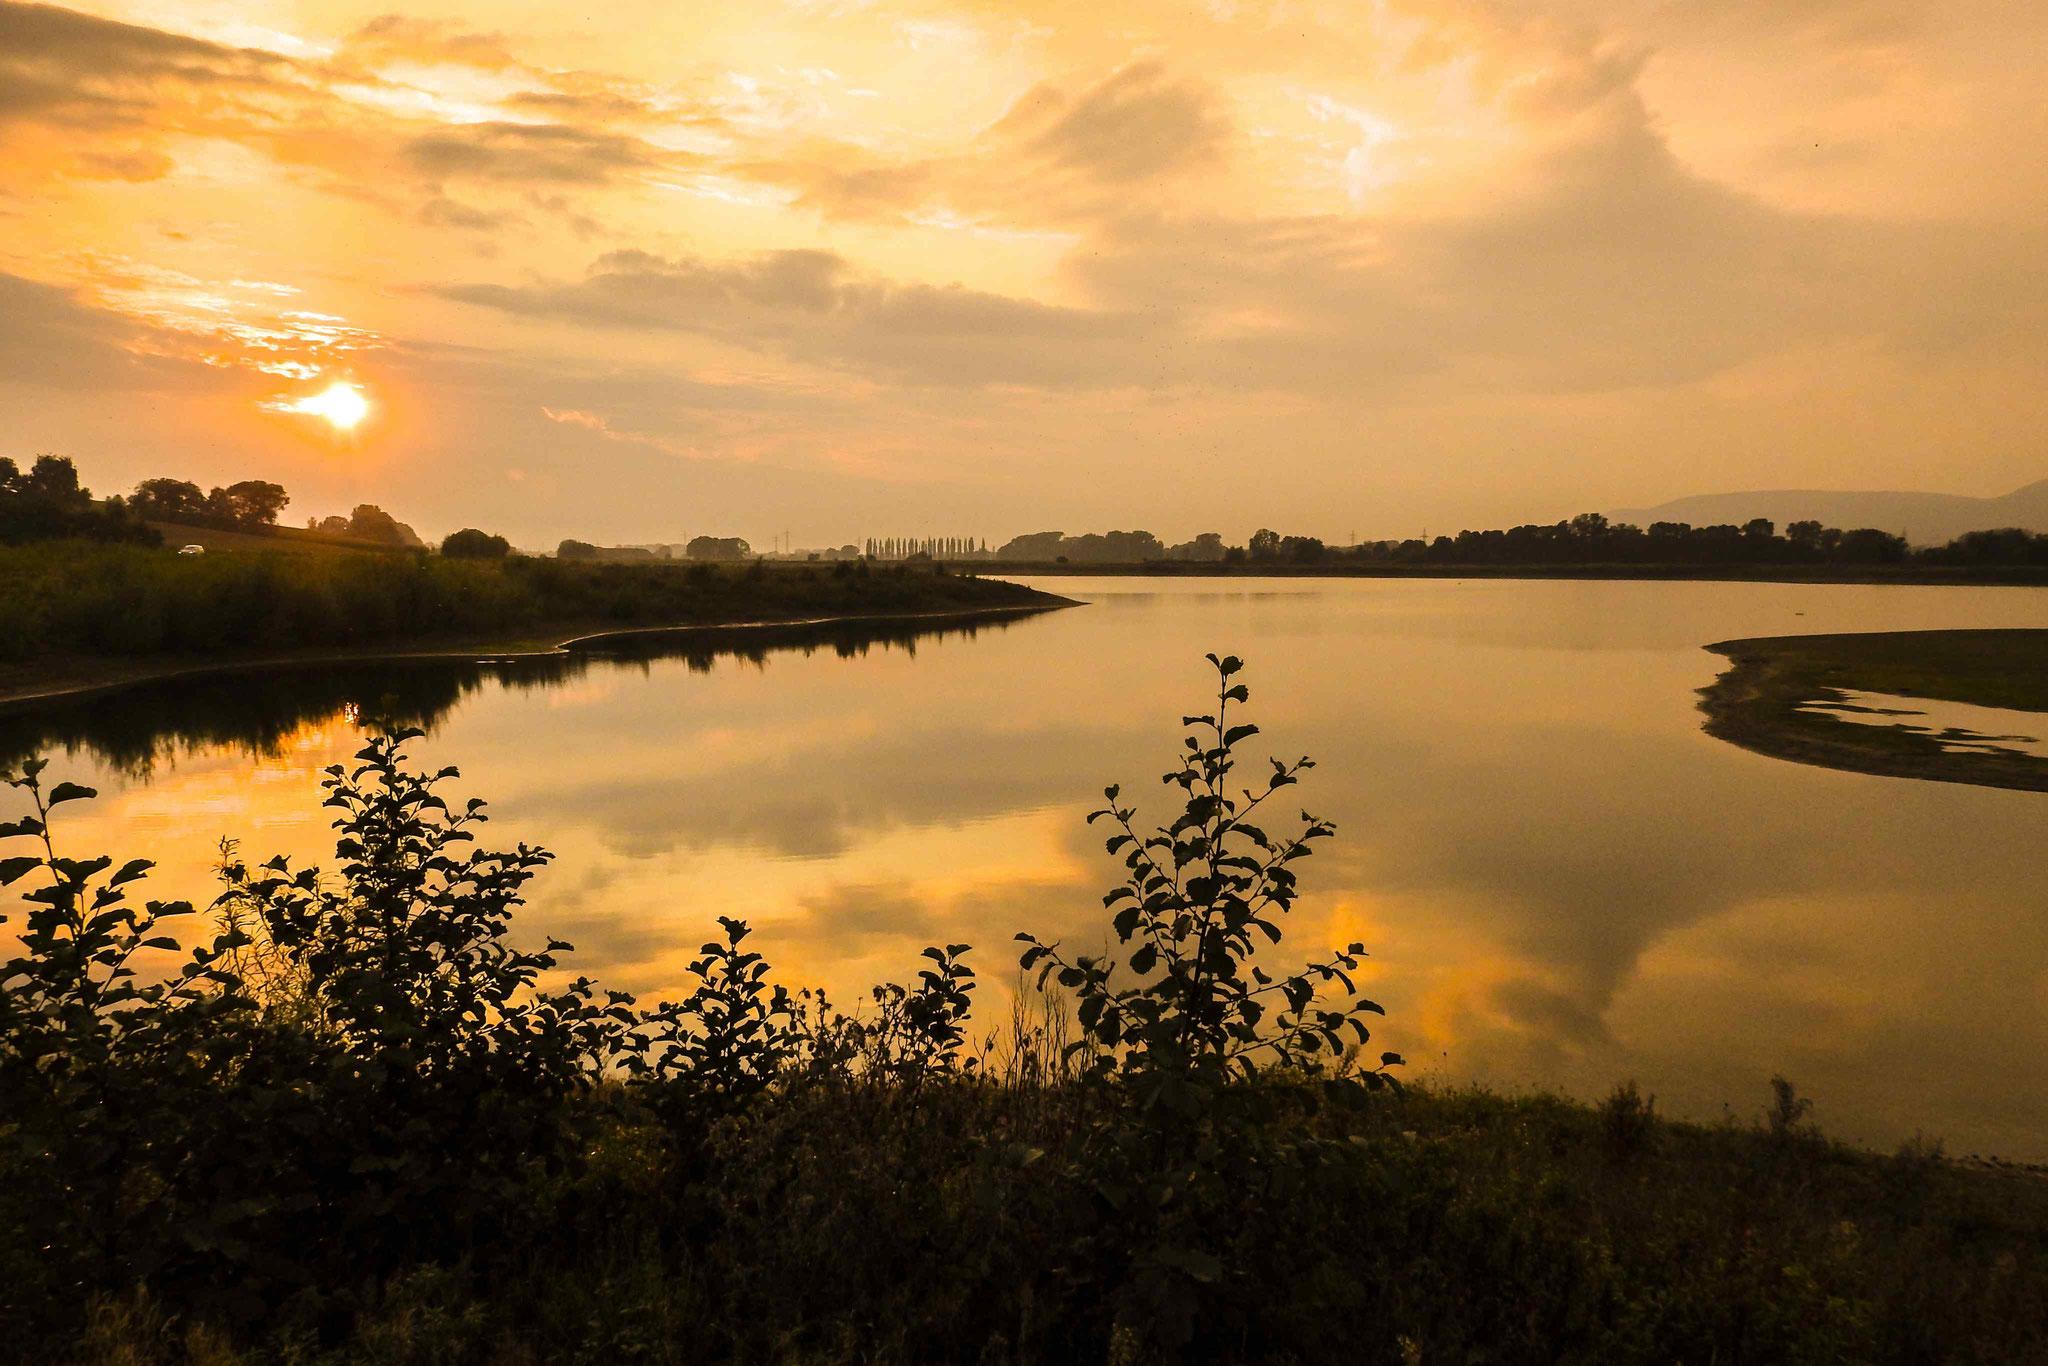 Auch den Sonnenuntergang kann man von der Beobachtungshütte aus gut sehen.